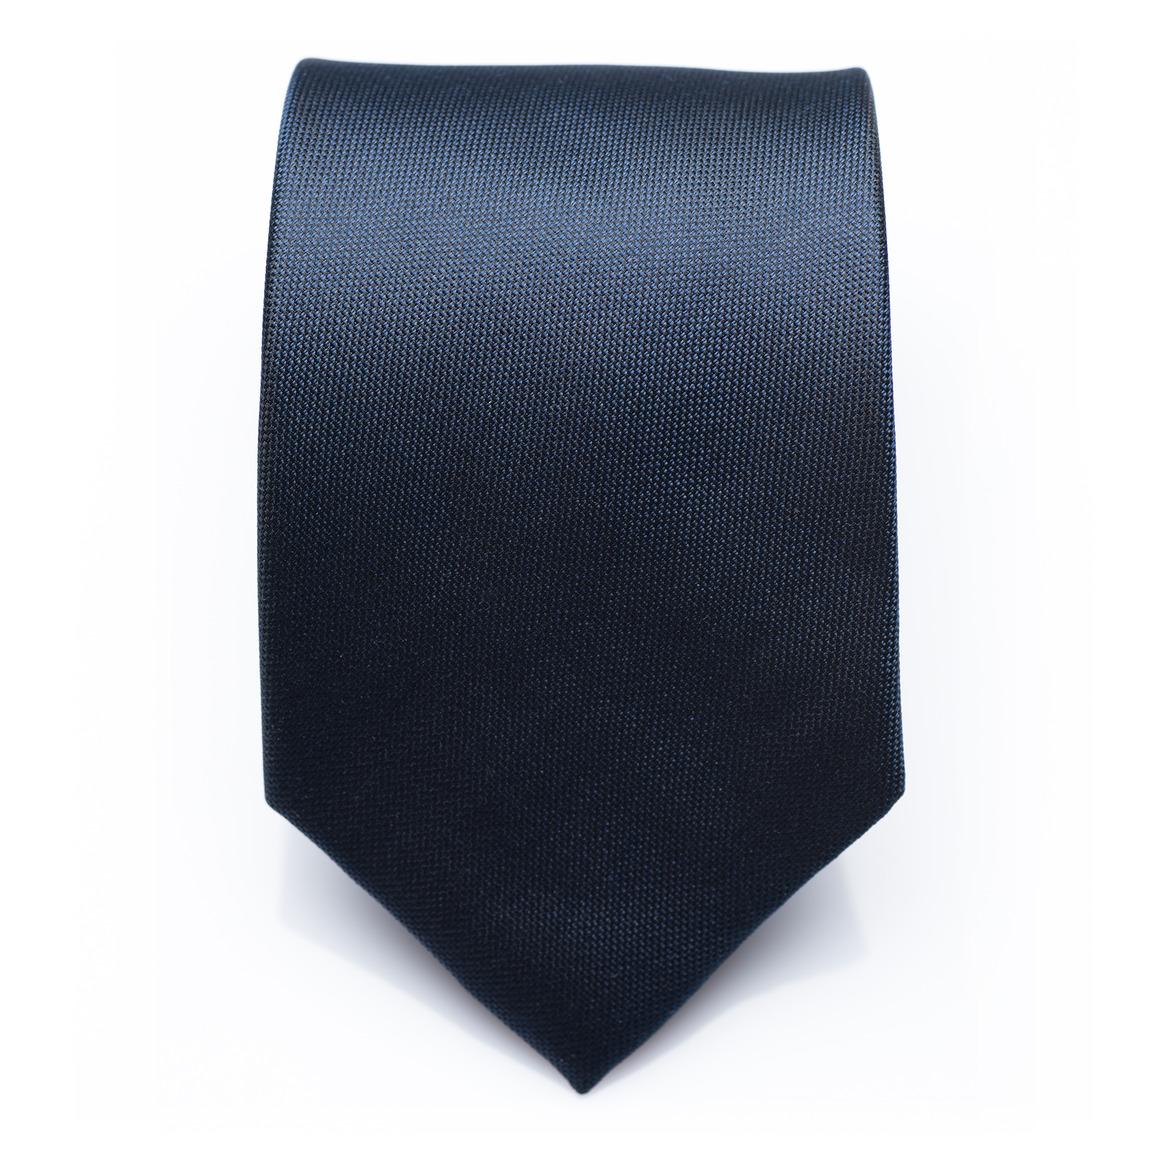 Kingsdale Persian - Blue silk necktie